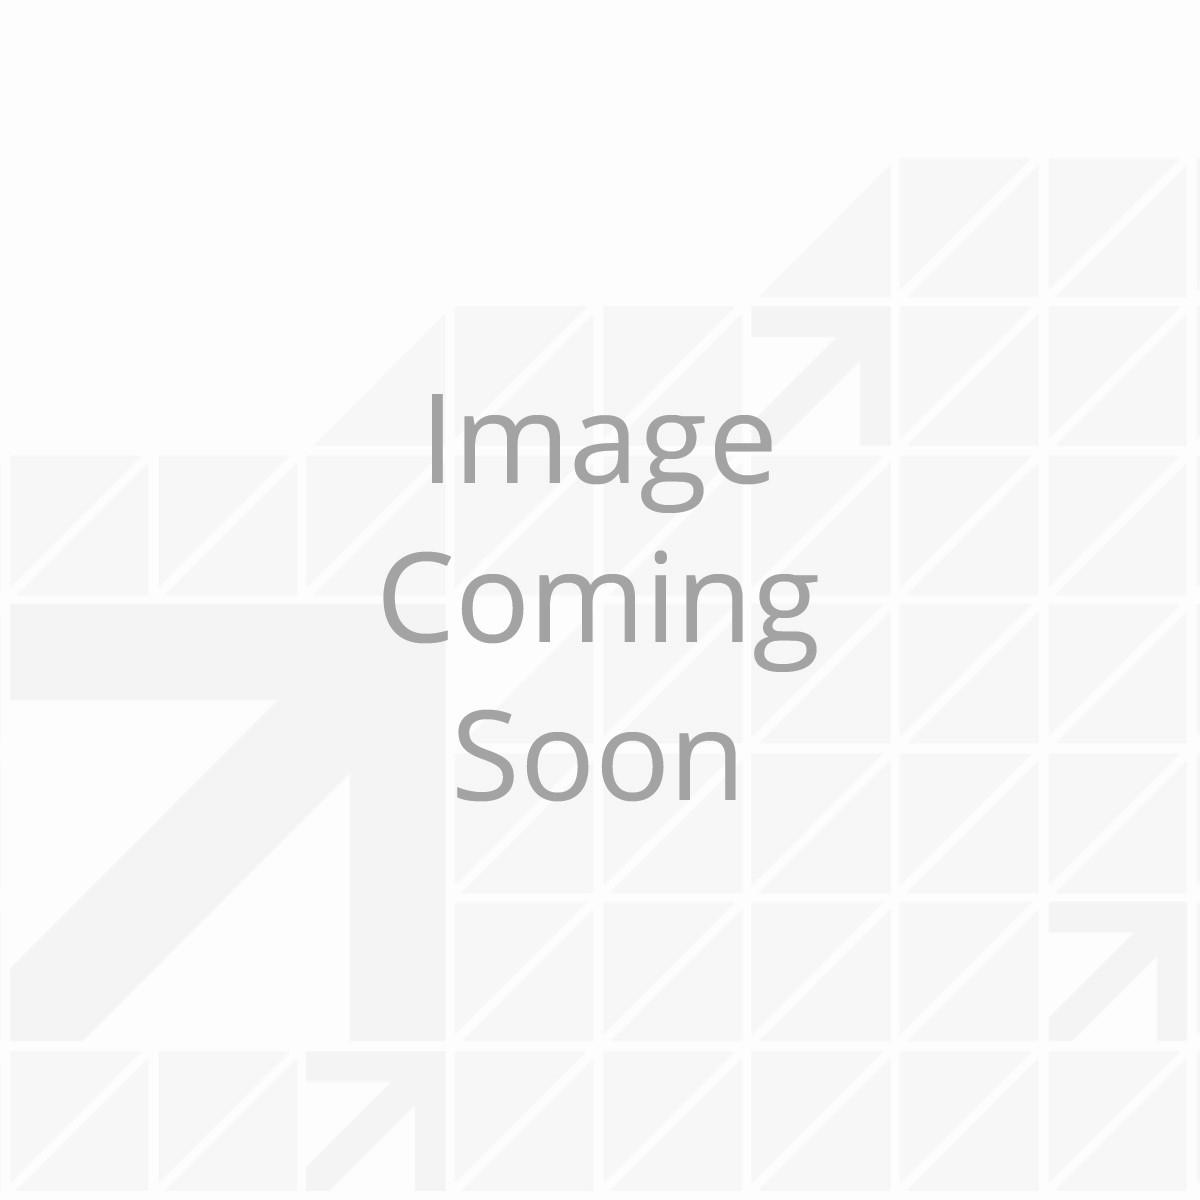 "Set Screw; M12 - 1.750"" x 1.378"" (Nylon)"